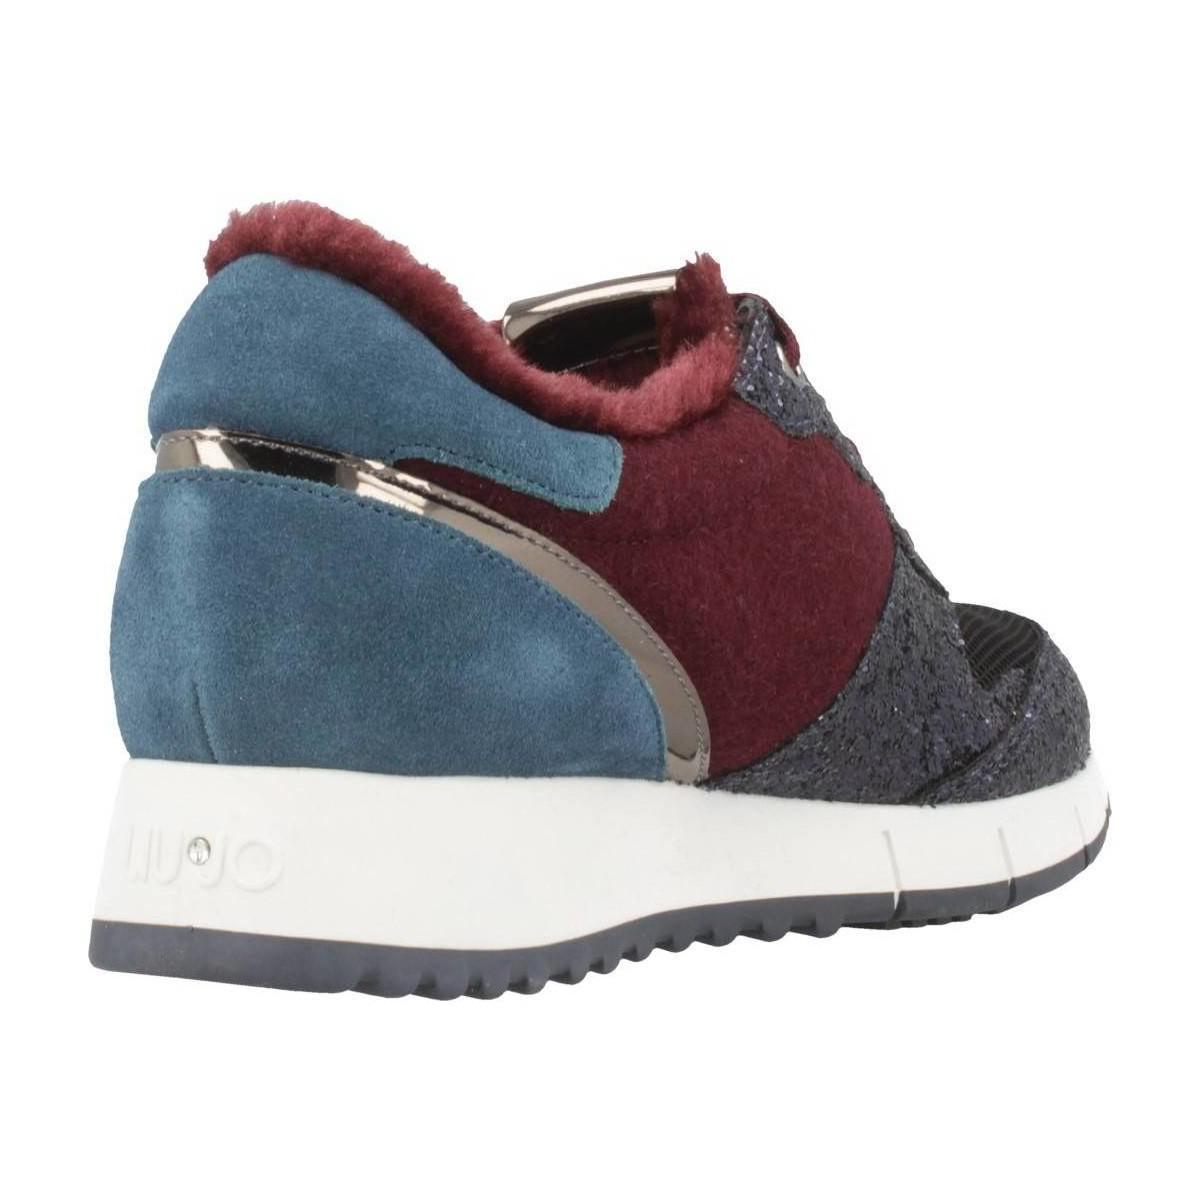 En Lyst Liu Chaussures Multicolor Femmes Gigi Jo BnUFv